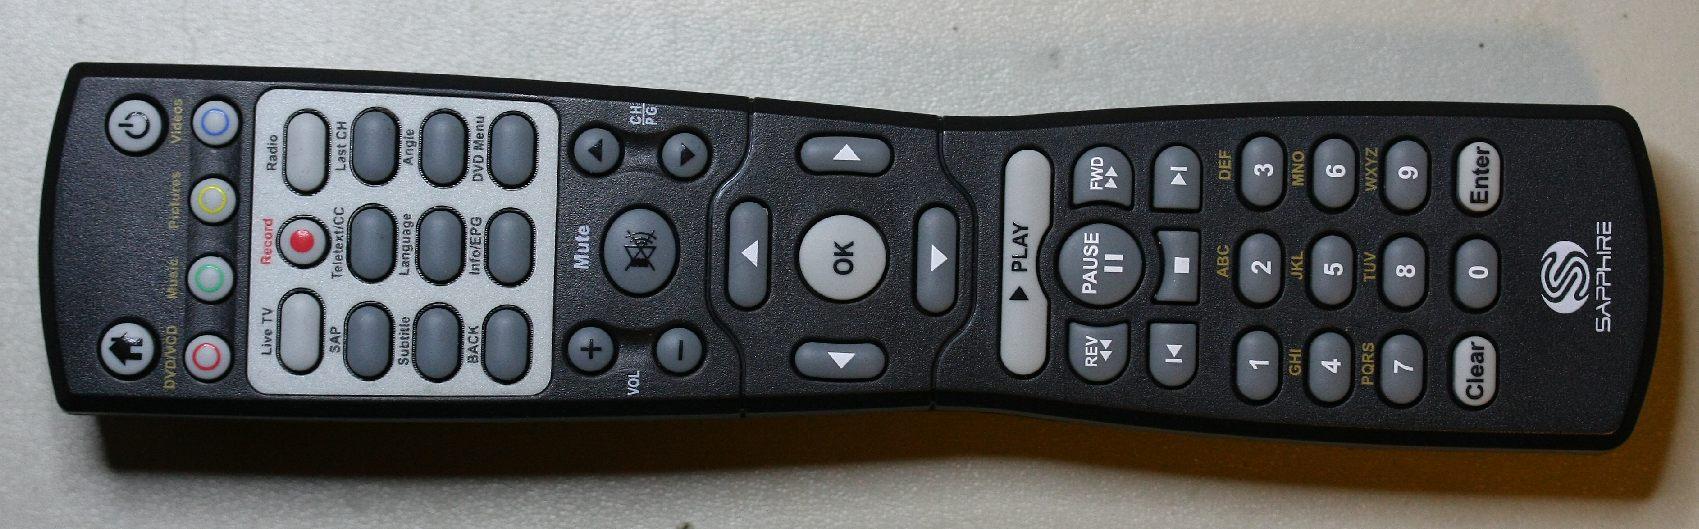 [Image: remote_face.jpg]